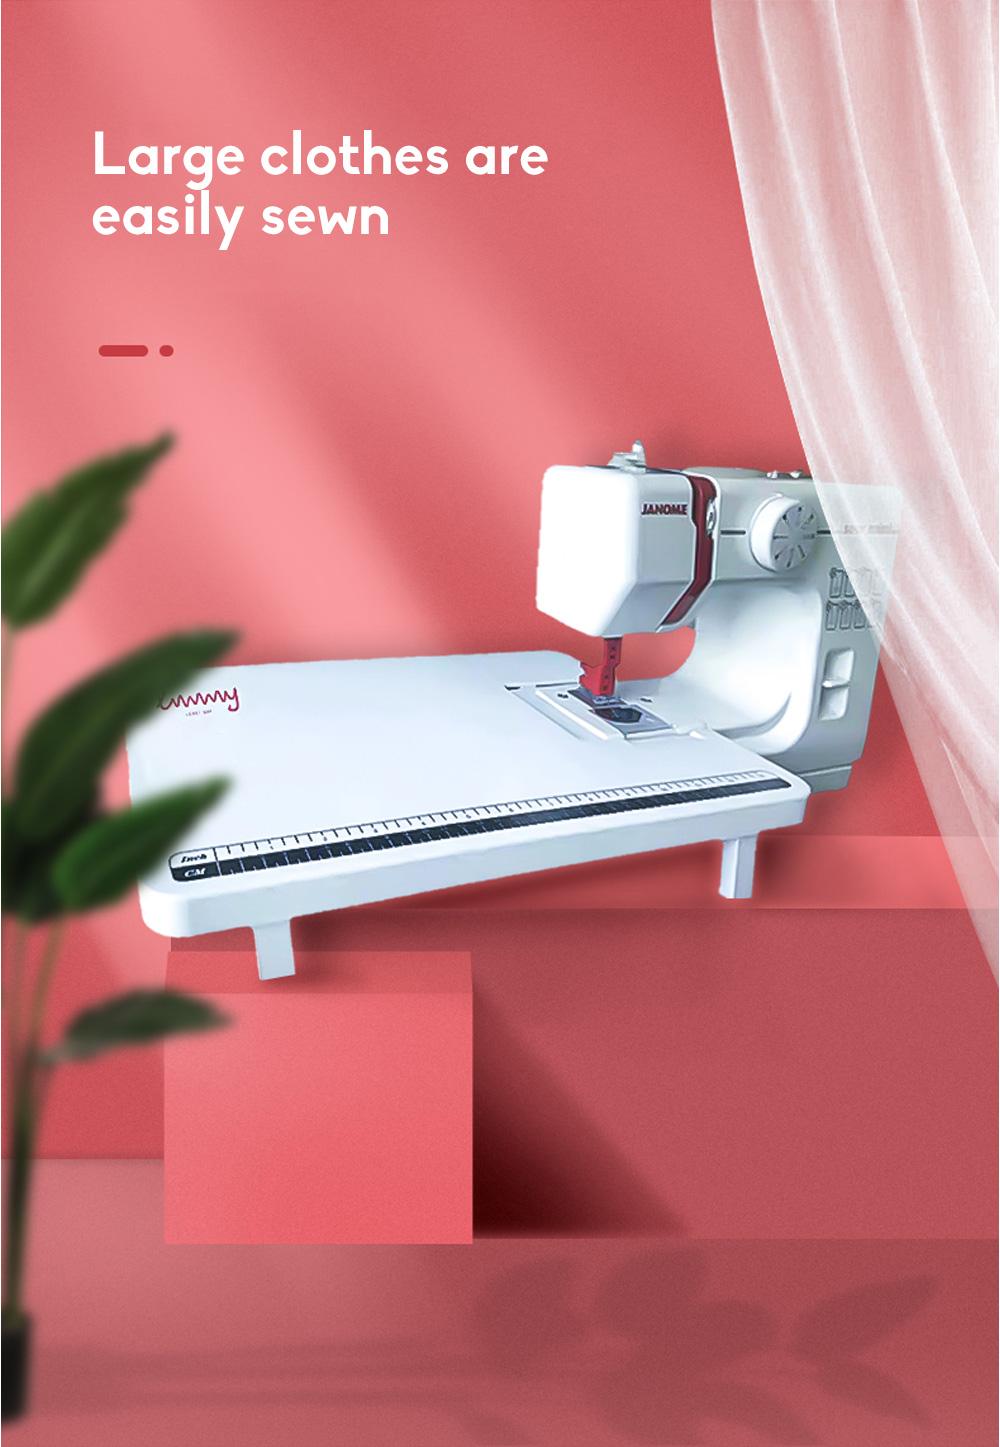 JANOME Electric Desktop Mini Home Sewing Machine Micro Bike Thick Multifunctional Manual Sewing  6